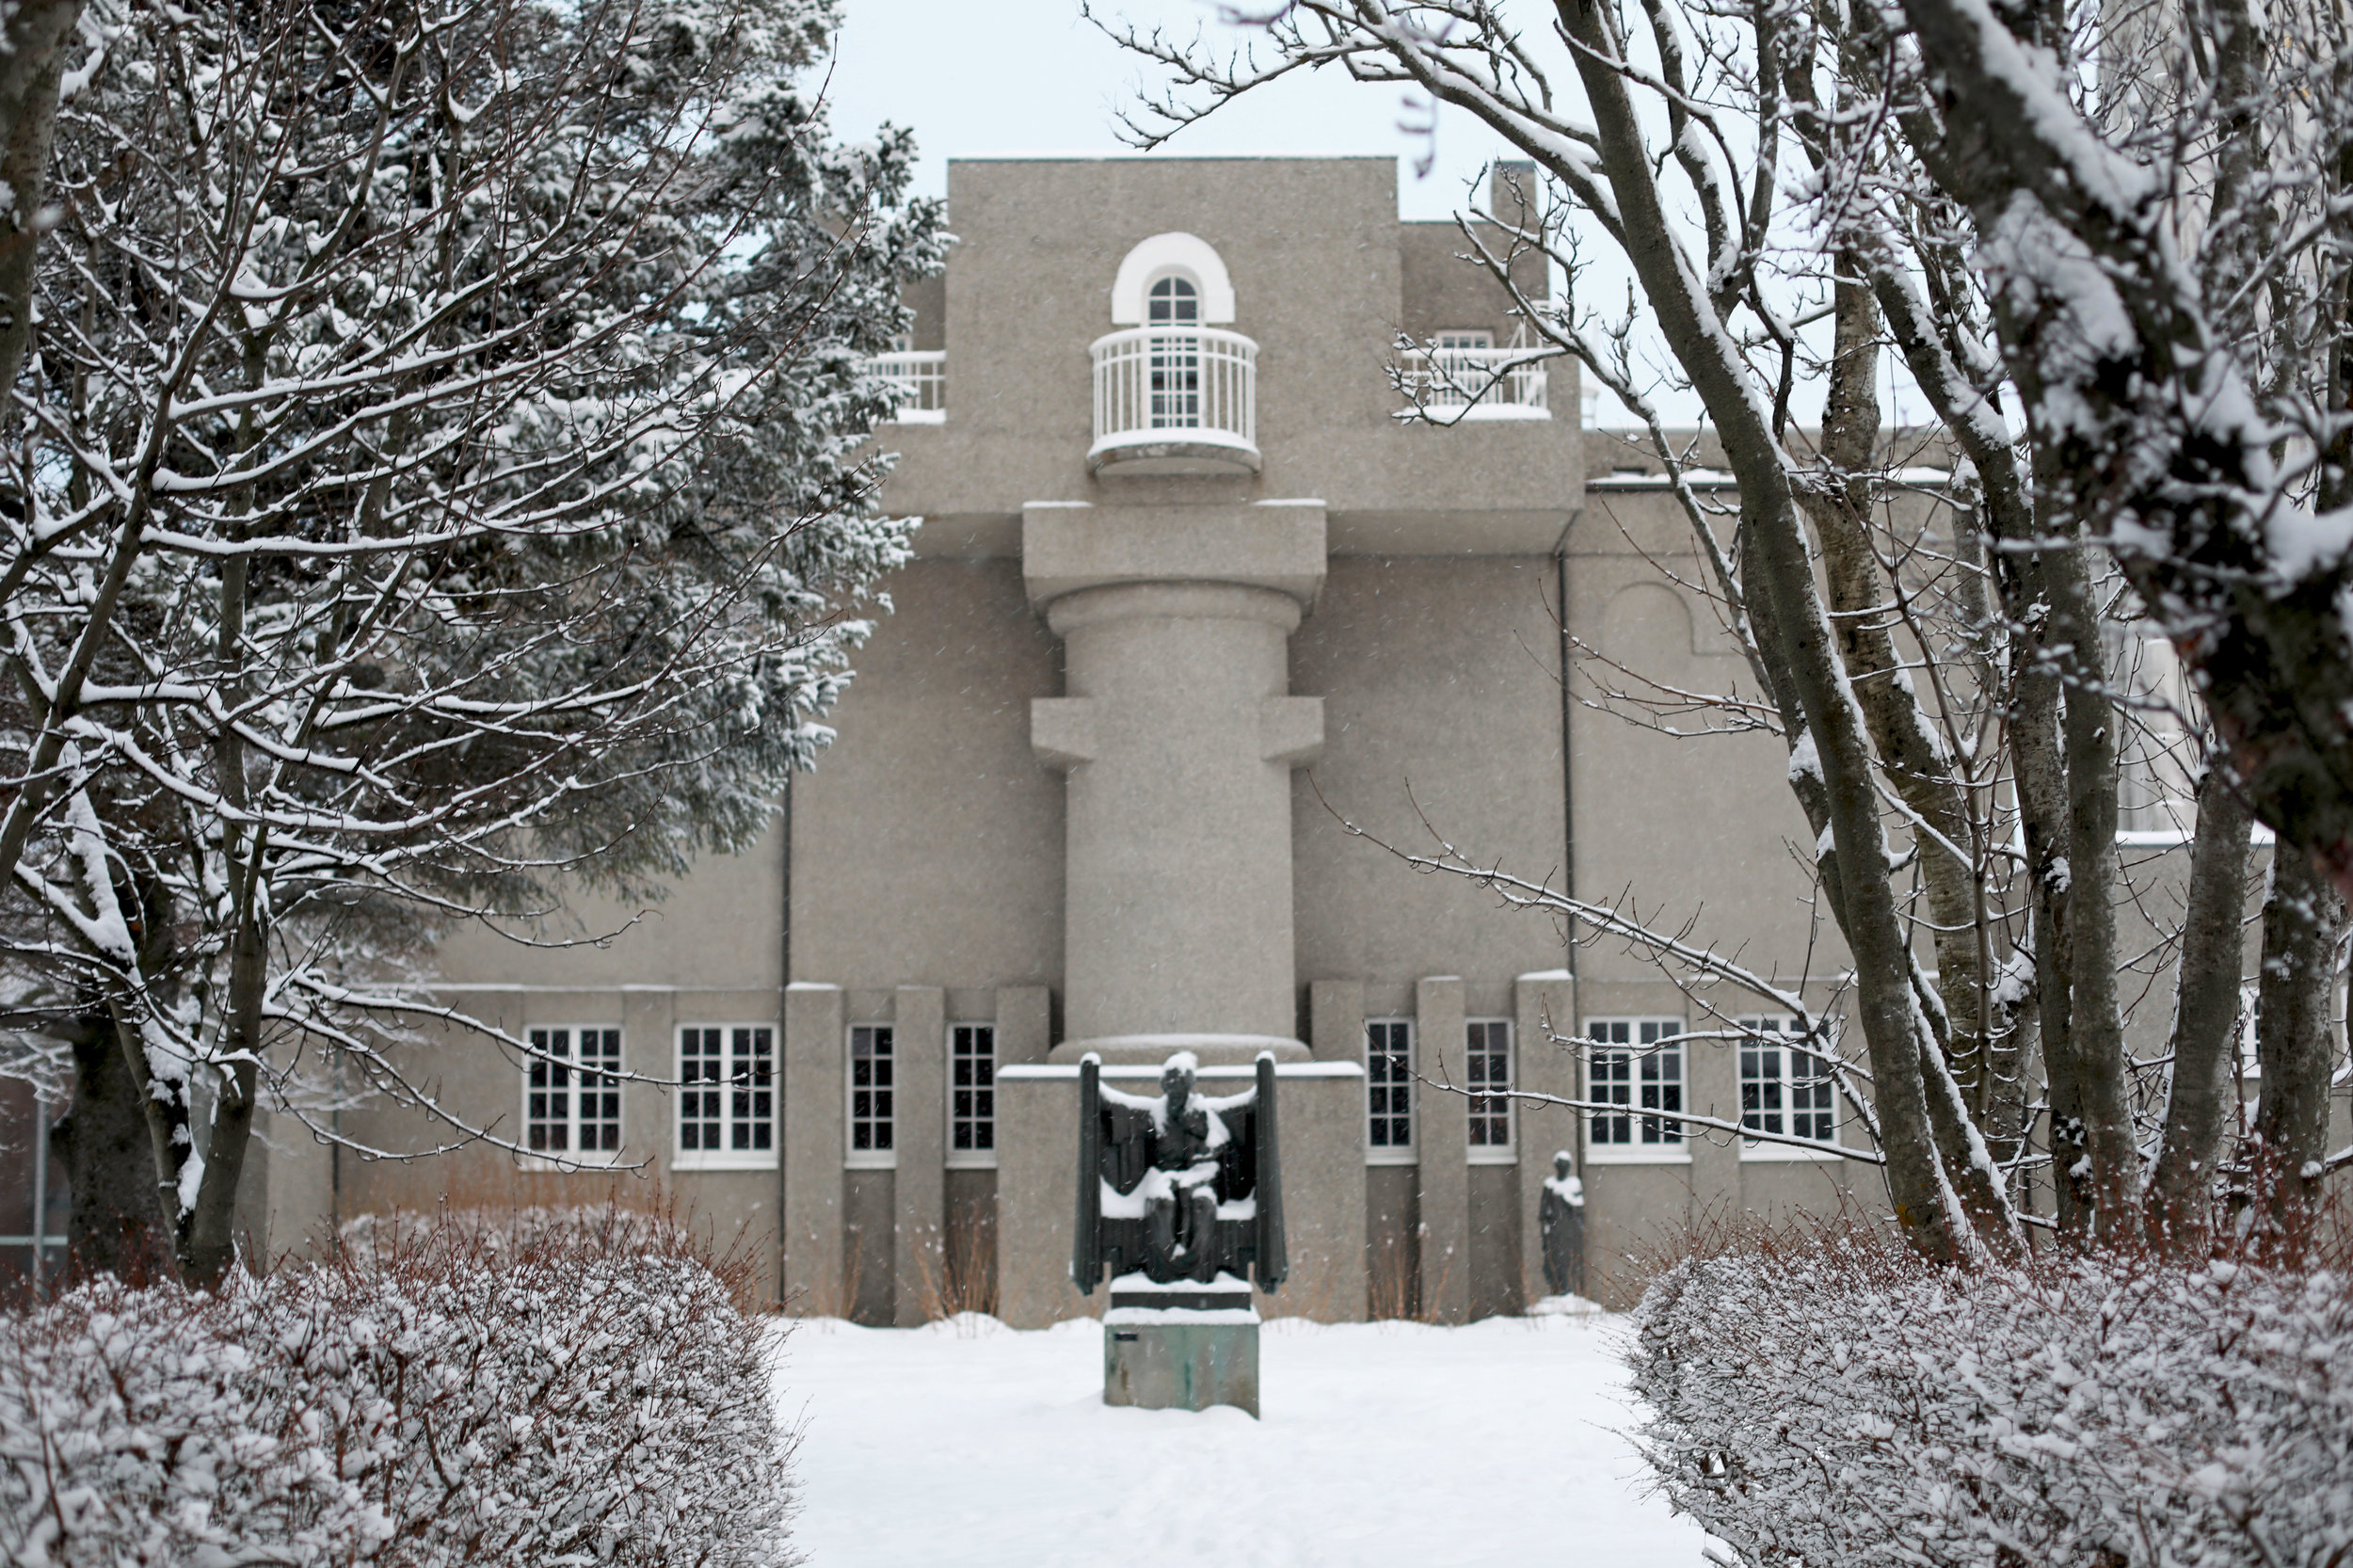 winter-snow-white-reykjavik-iceland-snowday-einarjonsson-höggmyndasafn